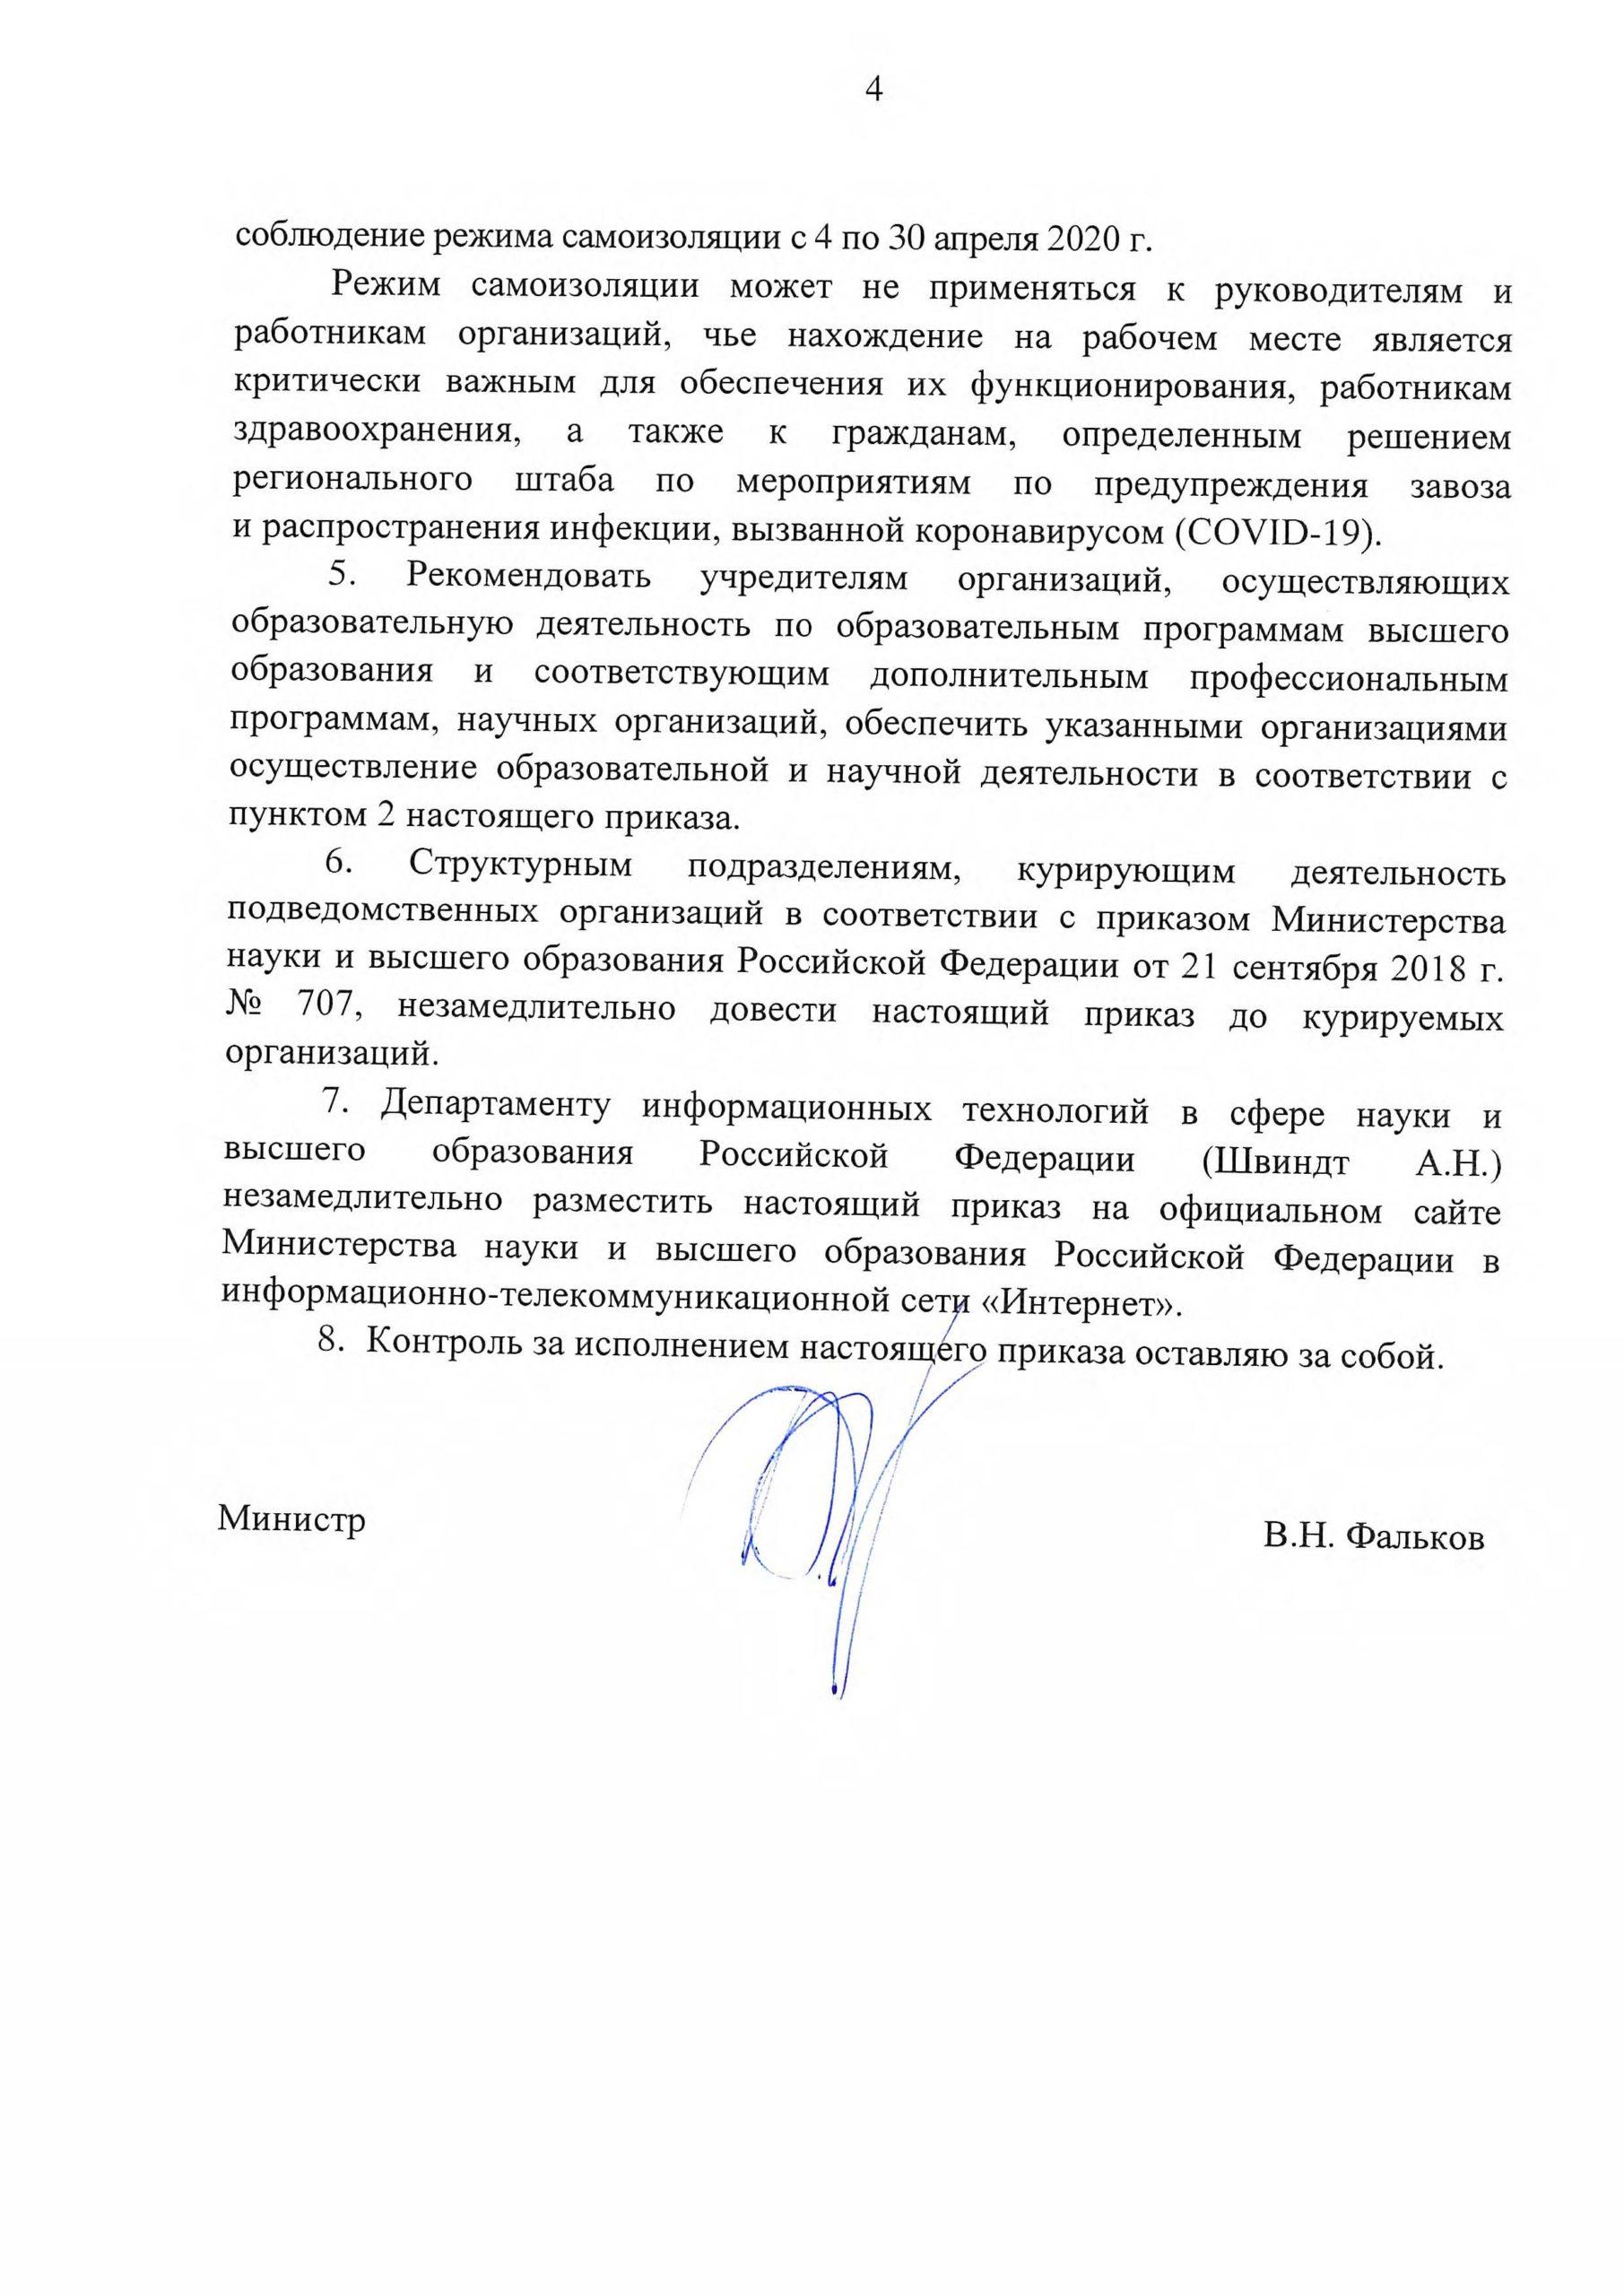 2020.04.02_prikaz_545_Falkov_V..pdf_Страница_4